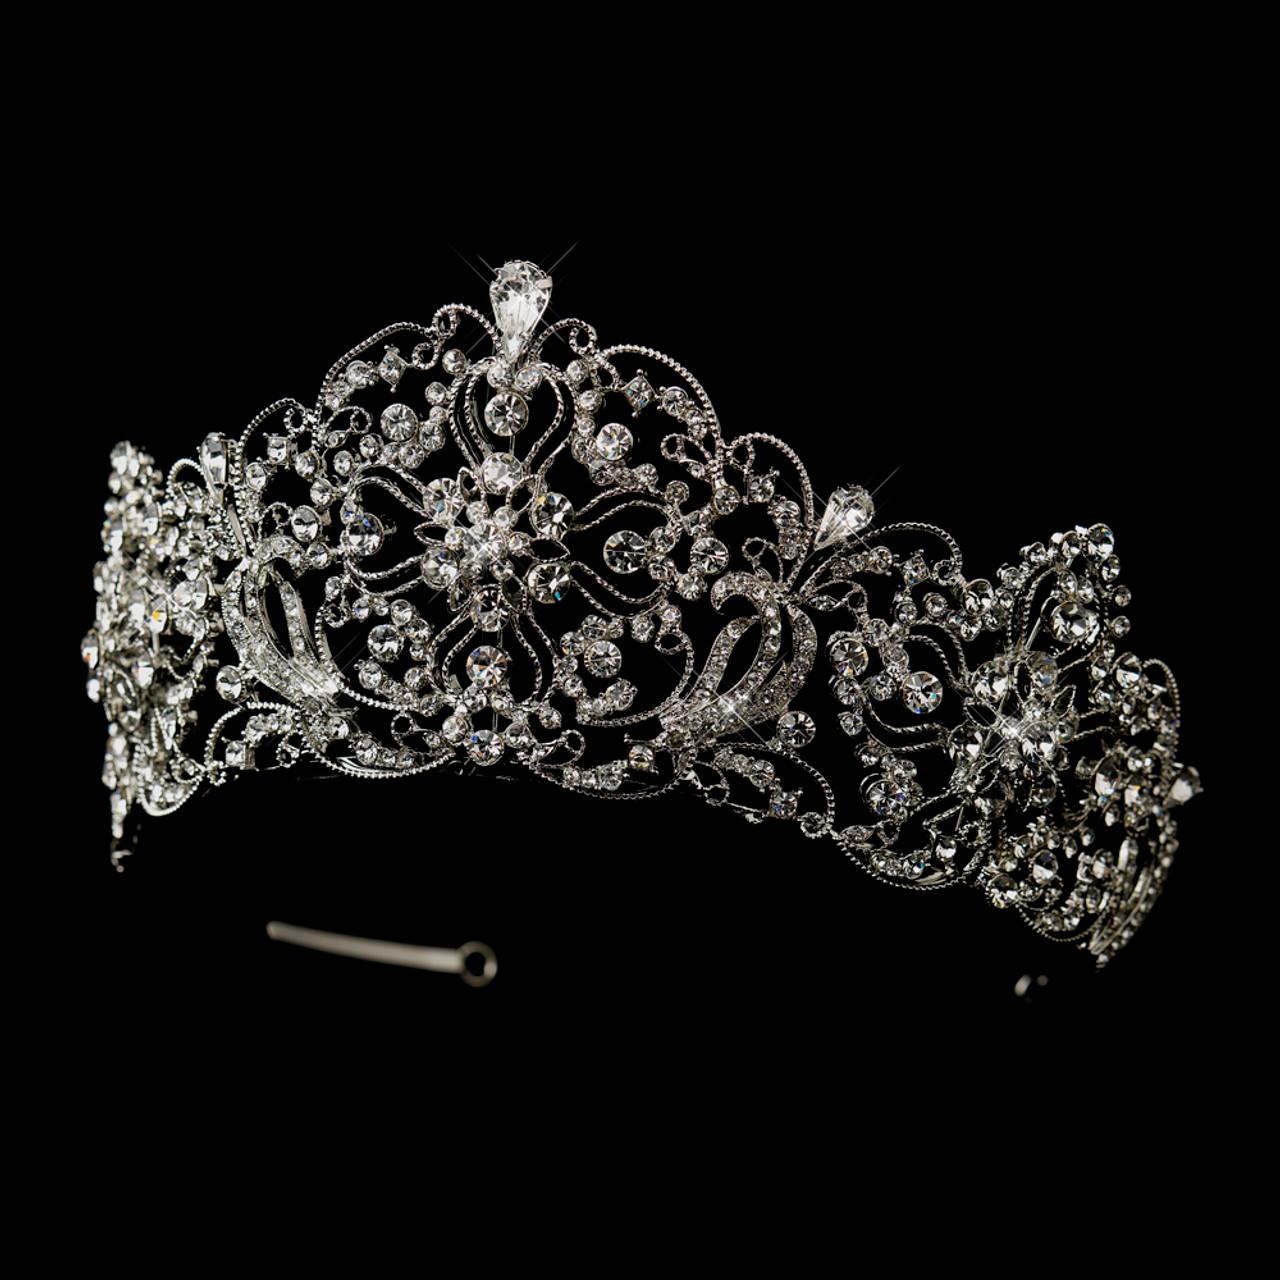 CAROLEE\u00a9 Crystal Clear Baguettes Silver Rhodium Plate Bracelet  Wedding Bride Bridesmaid